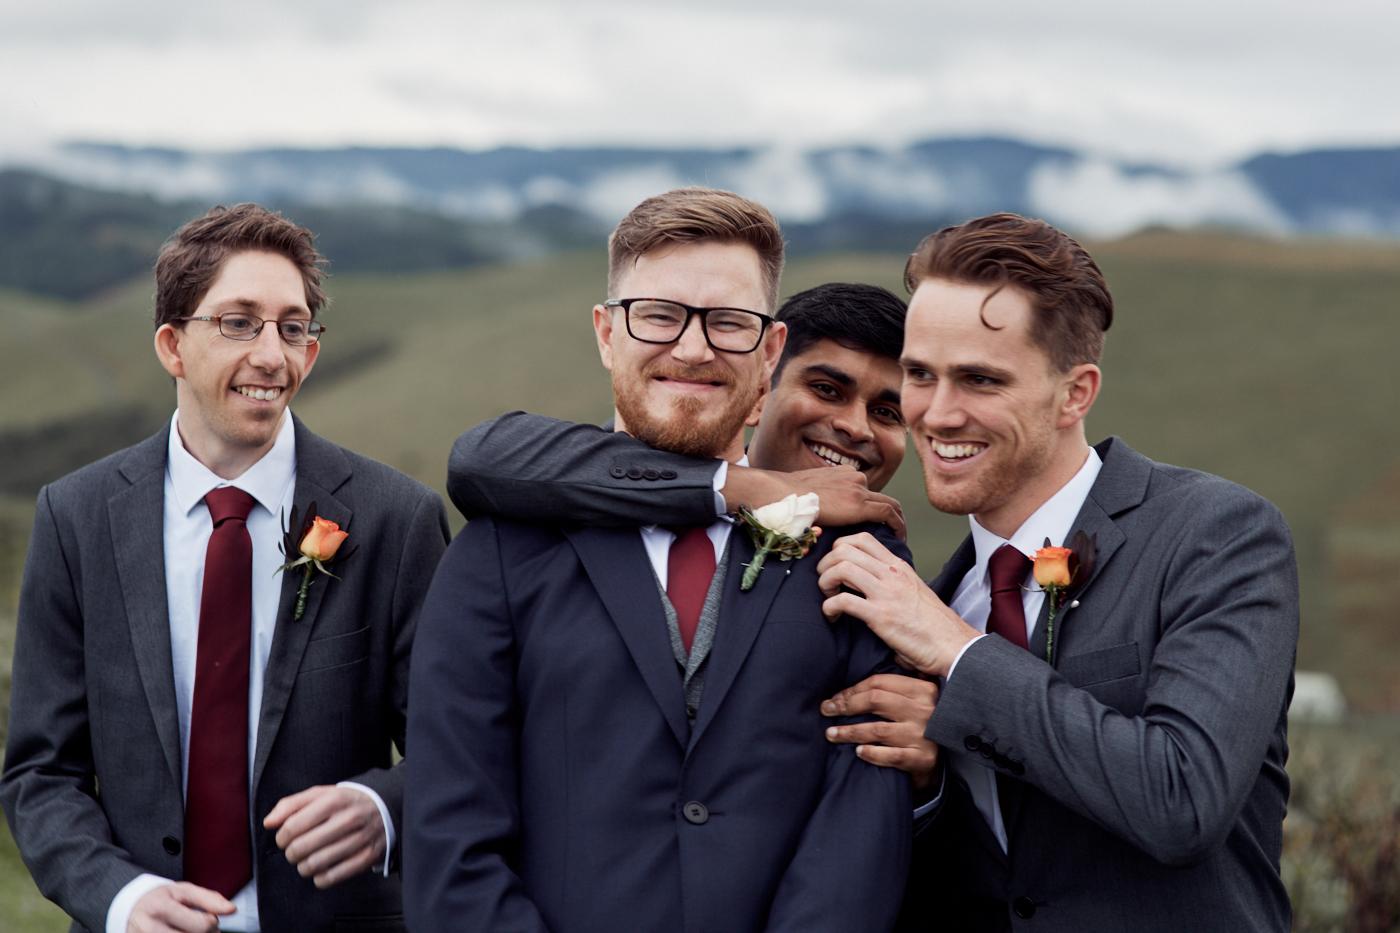 Groom and groomsmen fooling around